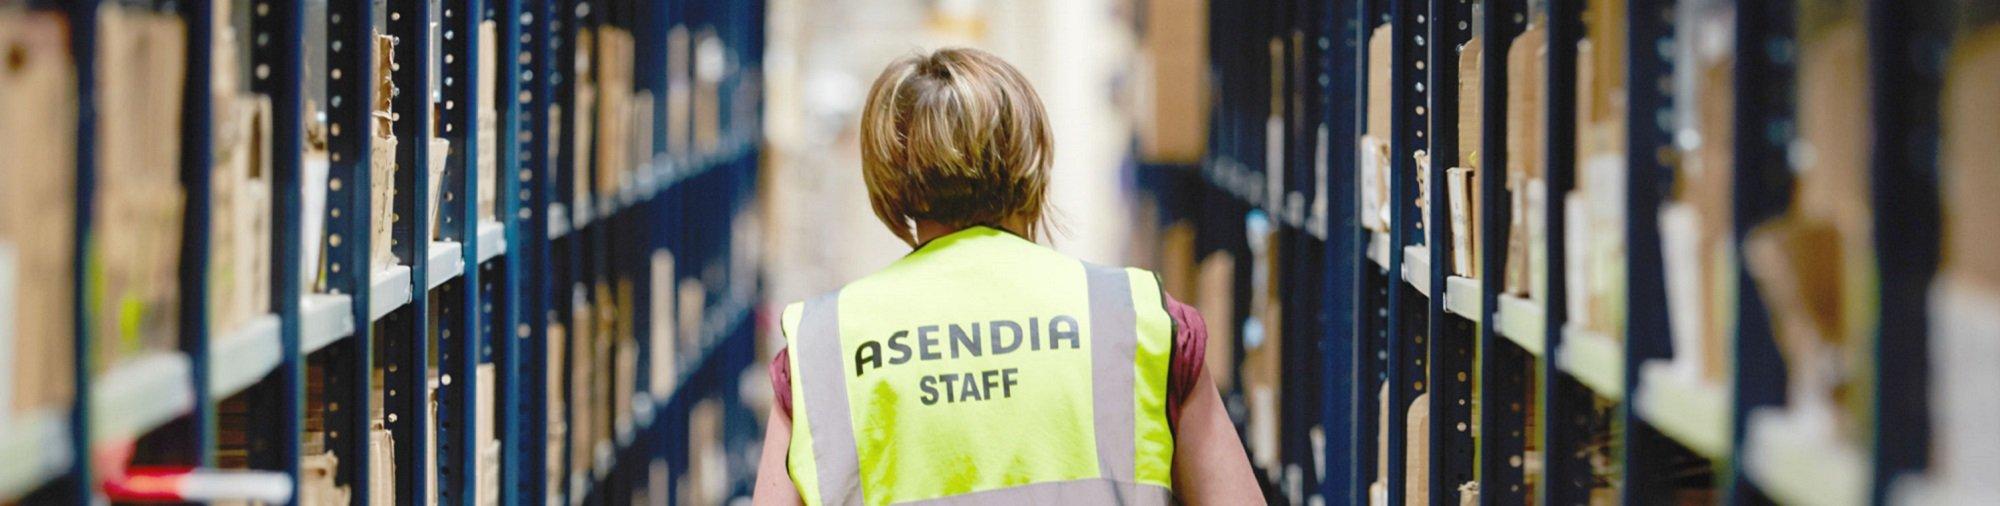 Asendia Careers header 500